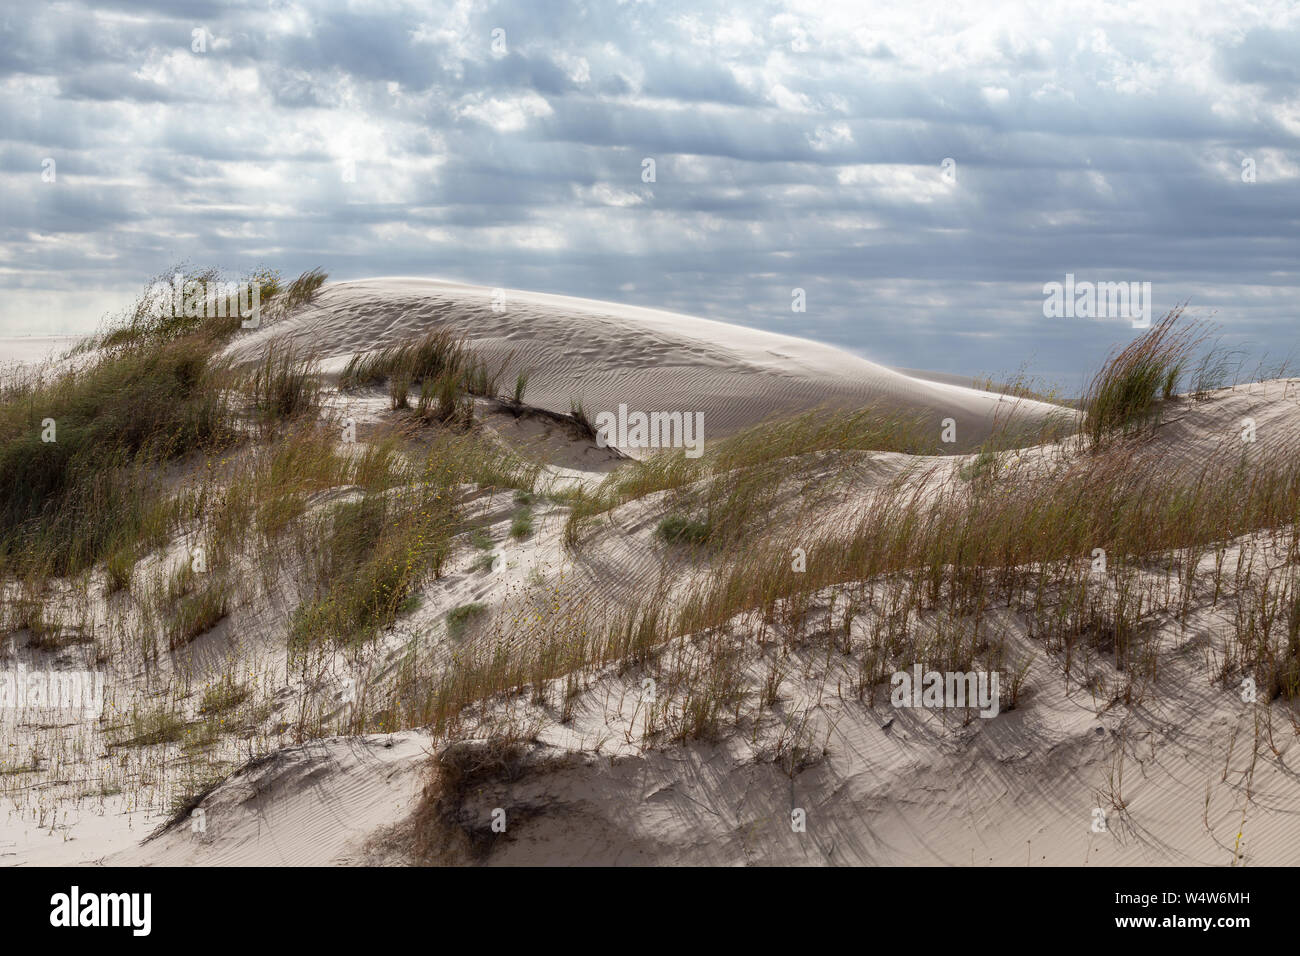 Sand Grains Stock Photos & Sand Grains Stock Images - Alamy